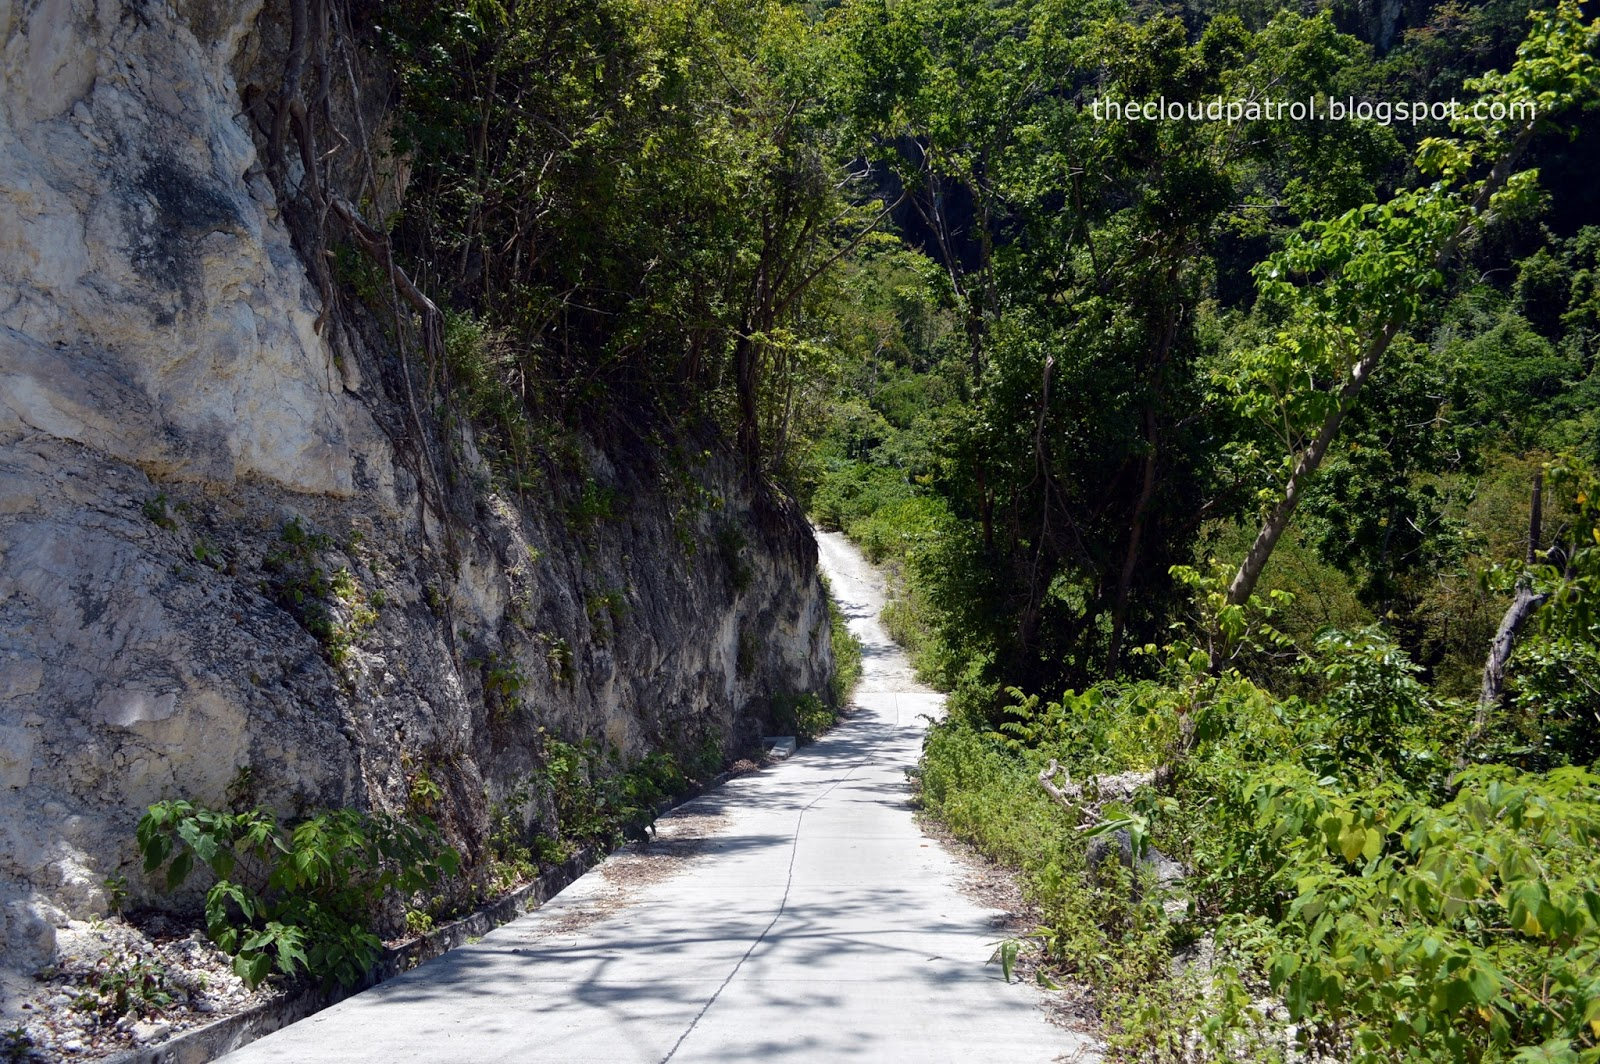 Butanding, whale shark, cebu, oslob, philippines, Tumalog, Waterfalls, mountain, hiking, hike, treking, trek